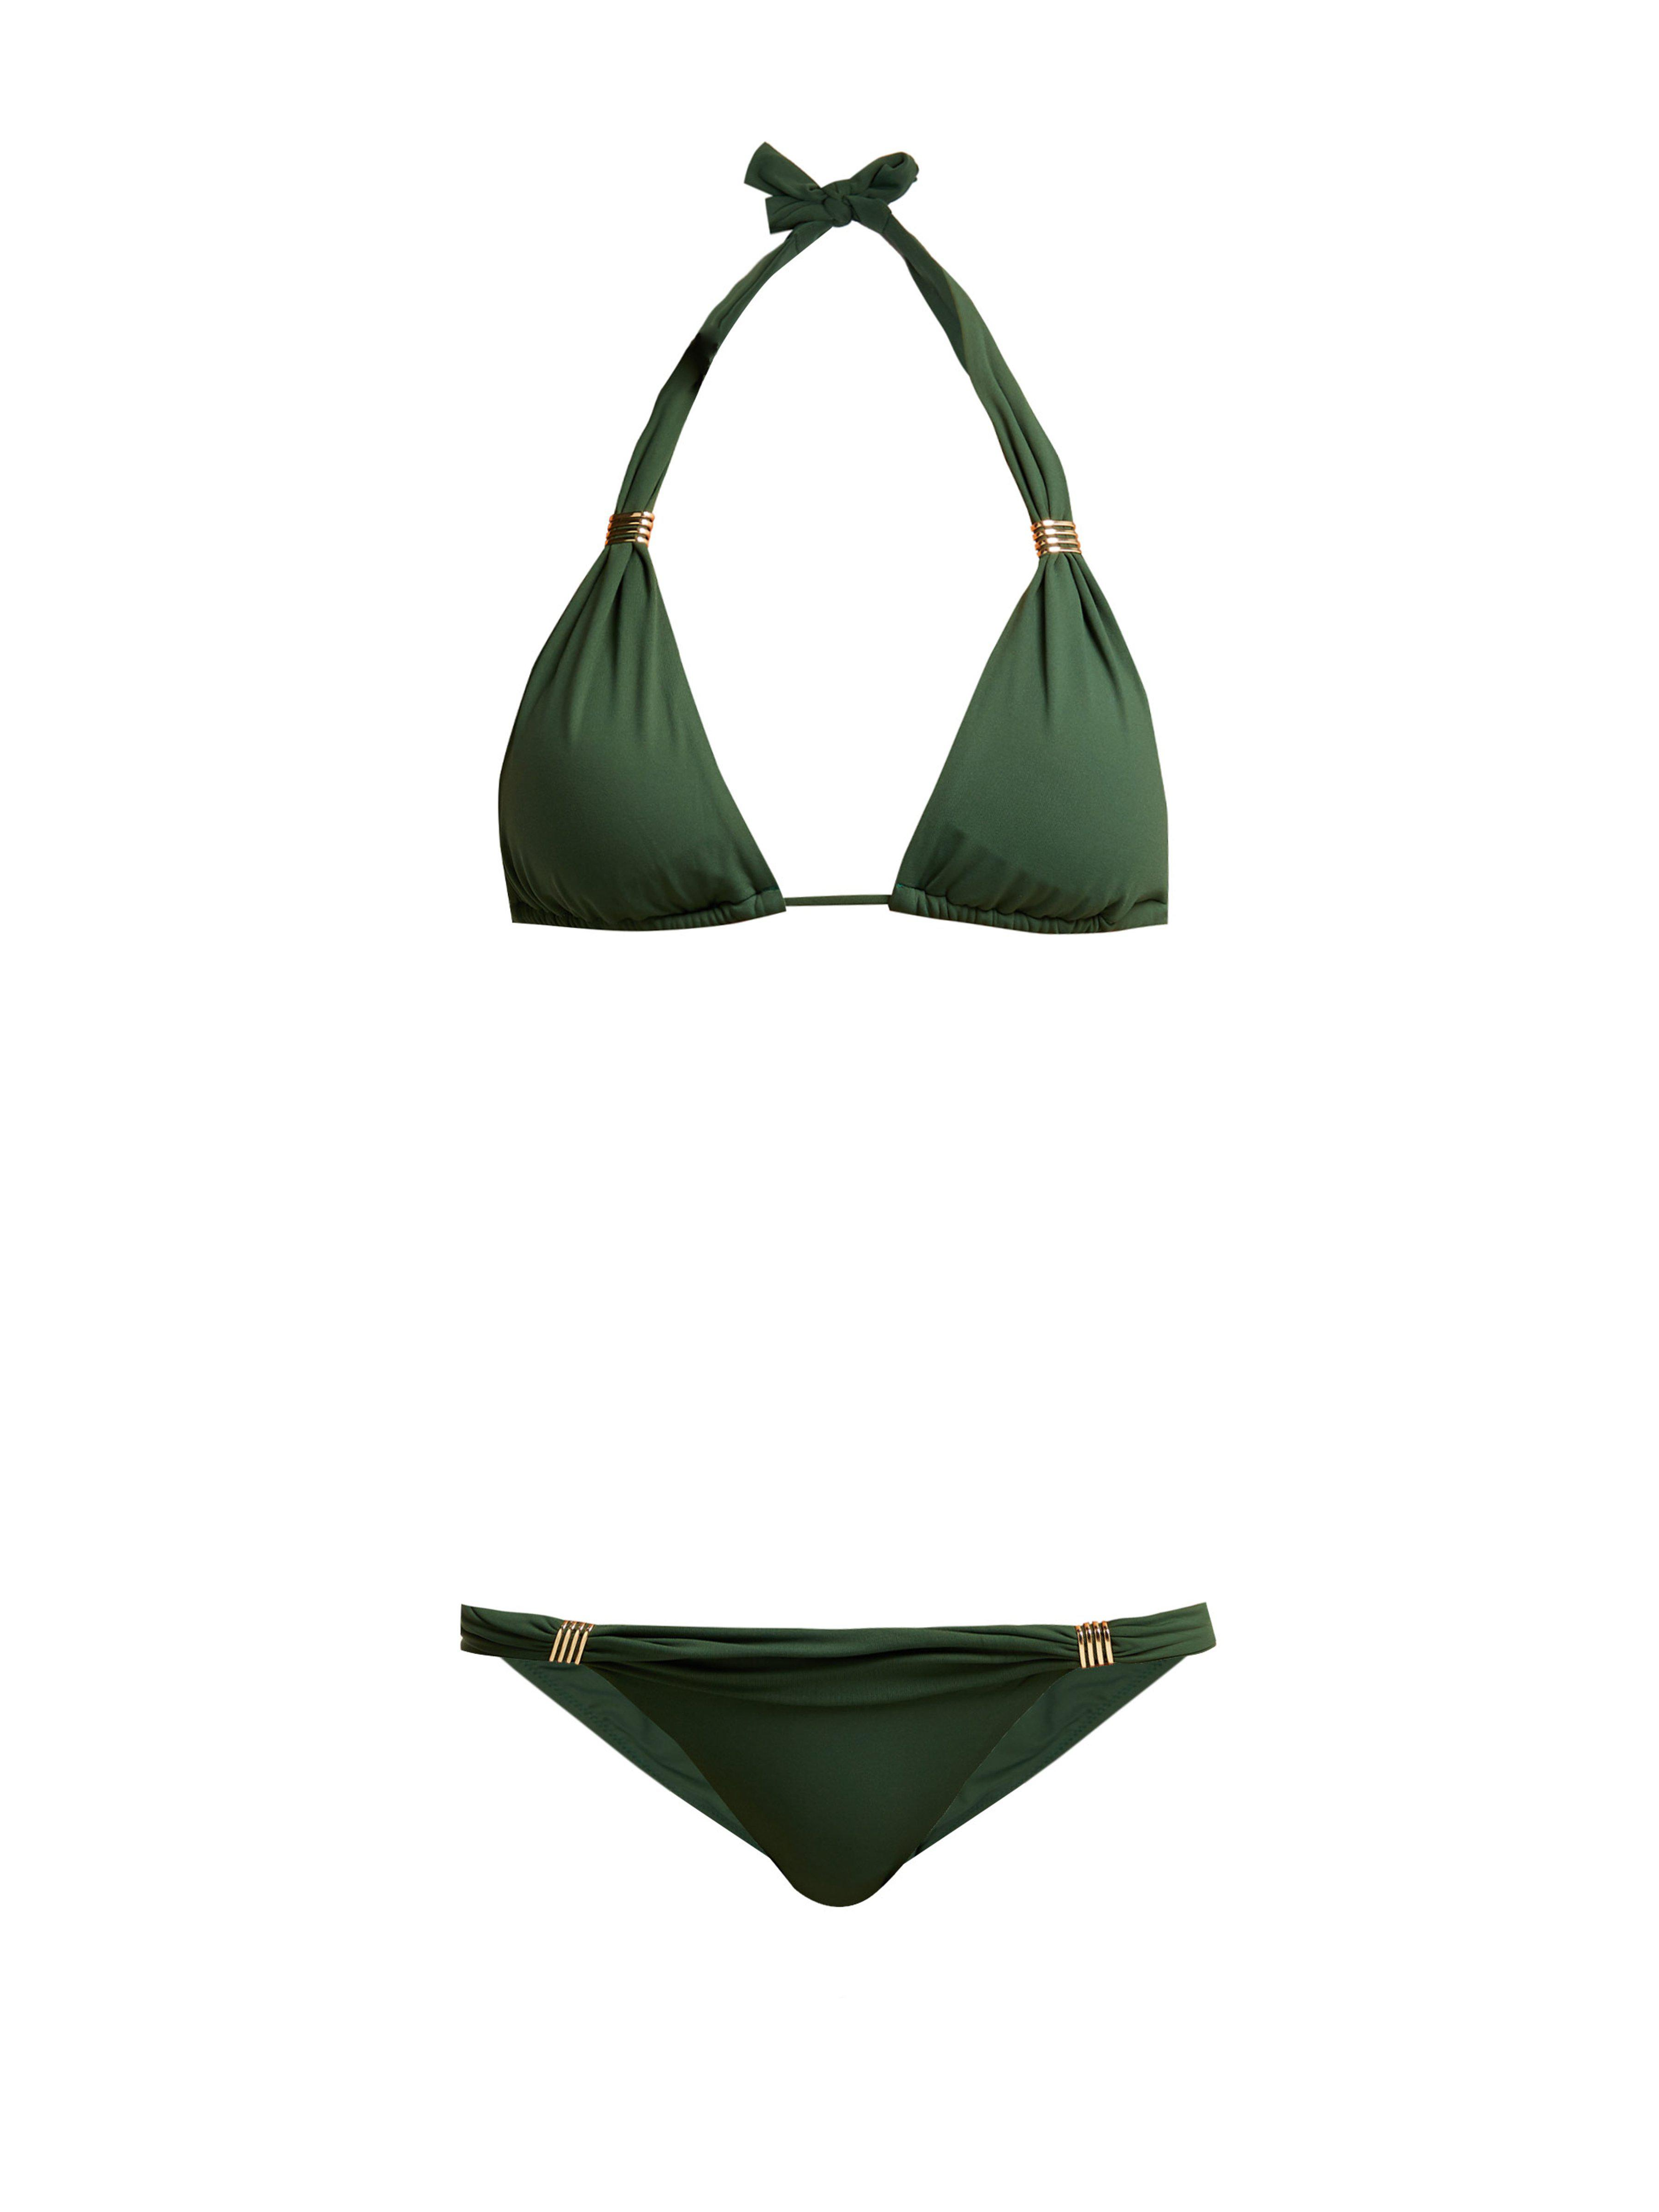 29fa936f2c Melissa Odabash Grenada Bikini in Green - Lyst